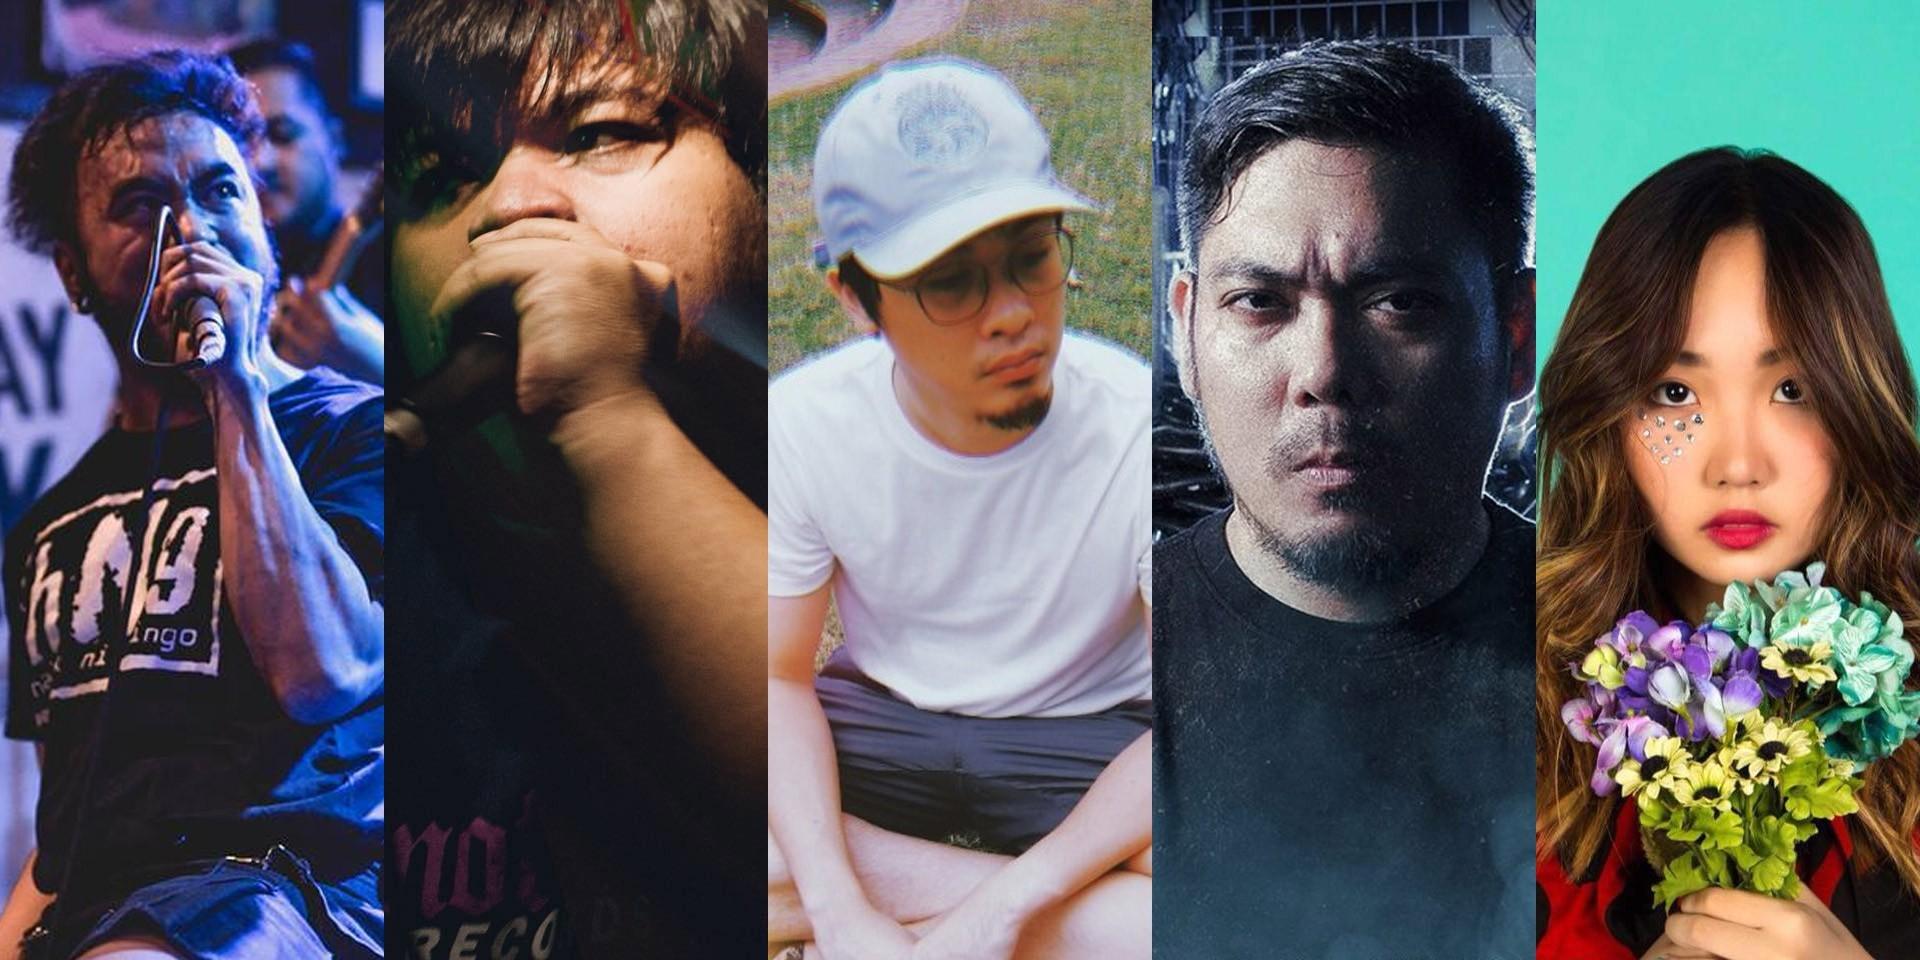 Halik Ni Gringo, Calix, Nights of Rizal, SkyChurch, Ena Mori release new music – listen